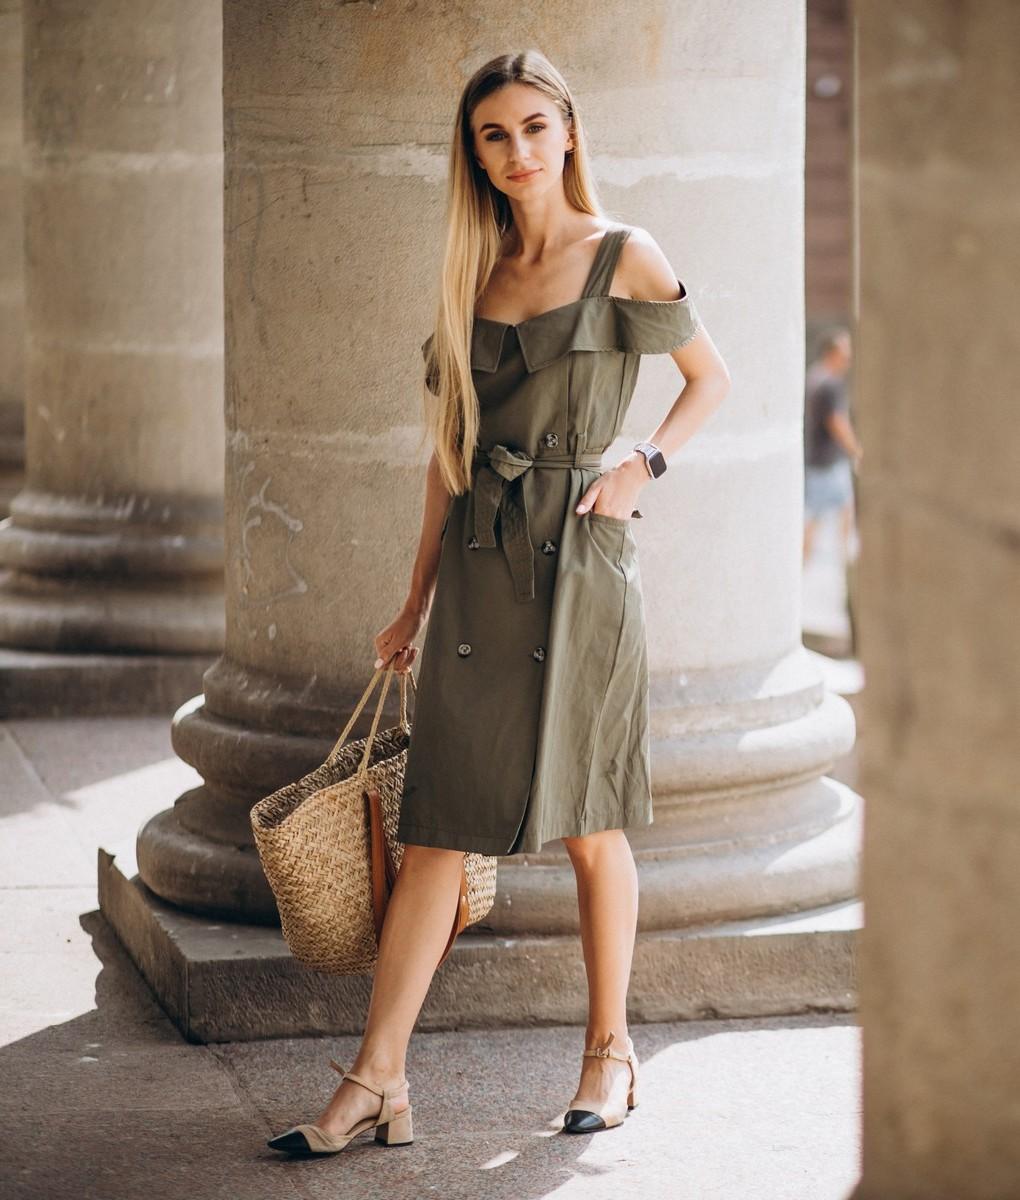 zenska-kolekcija-suknje-3